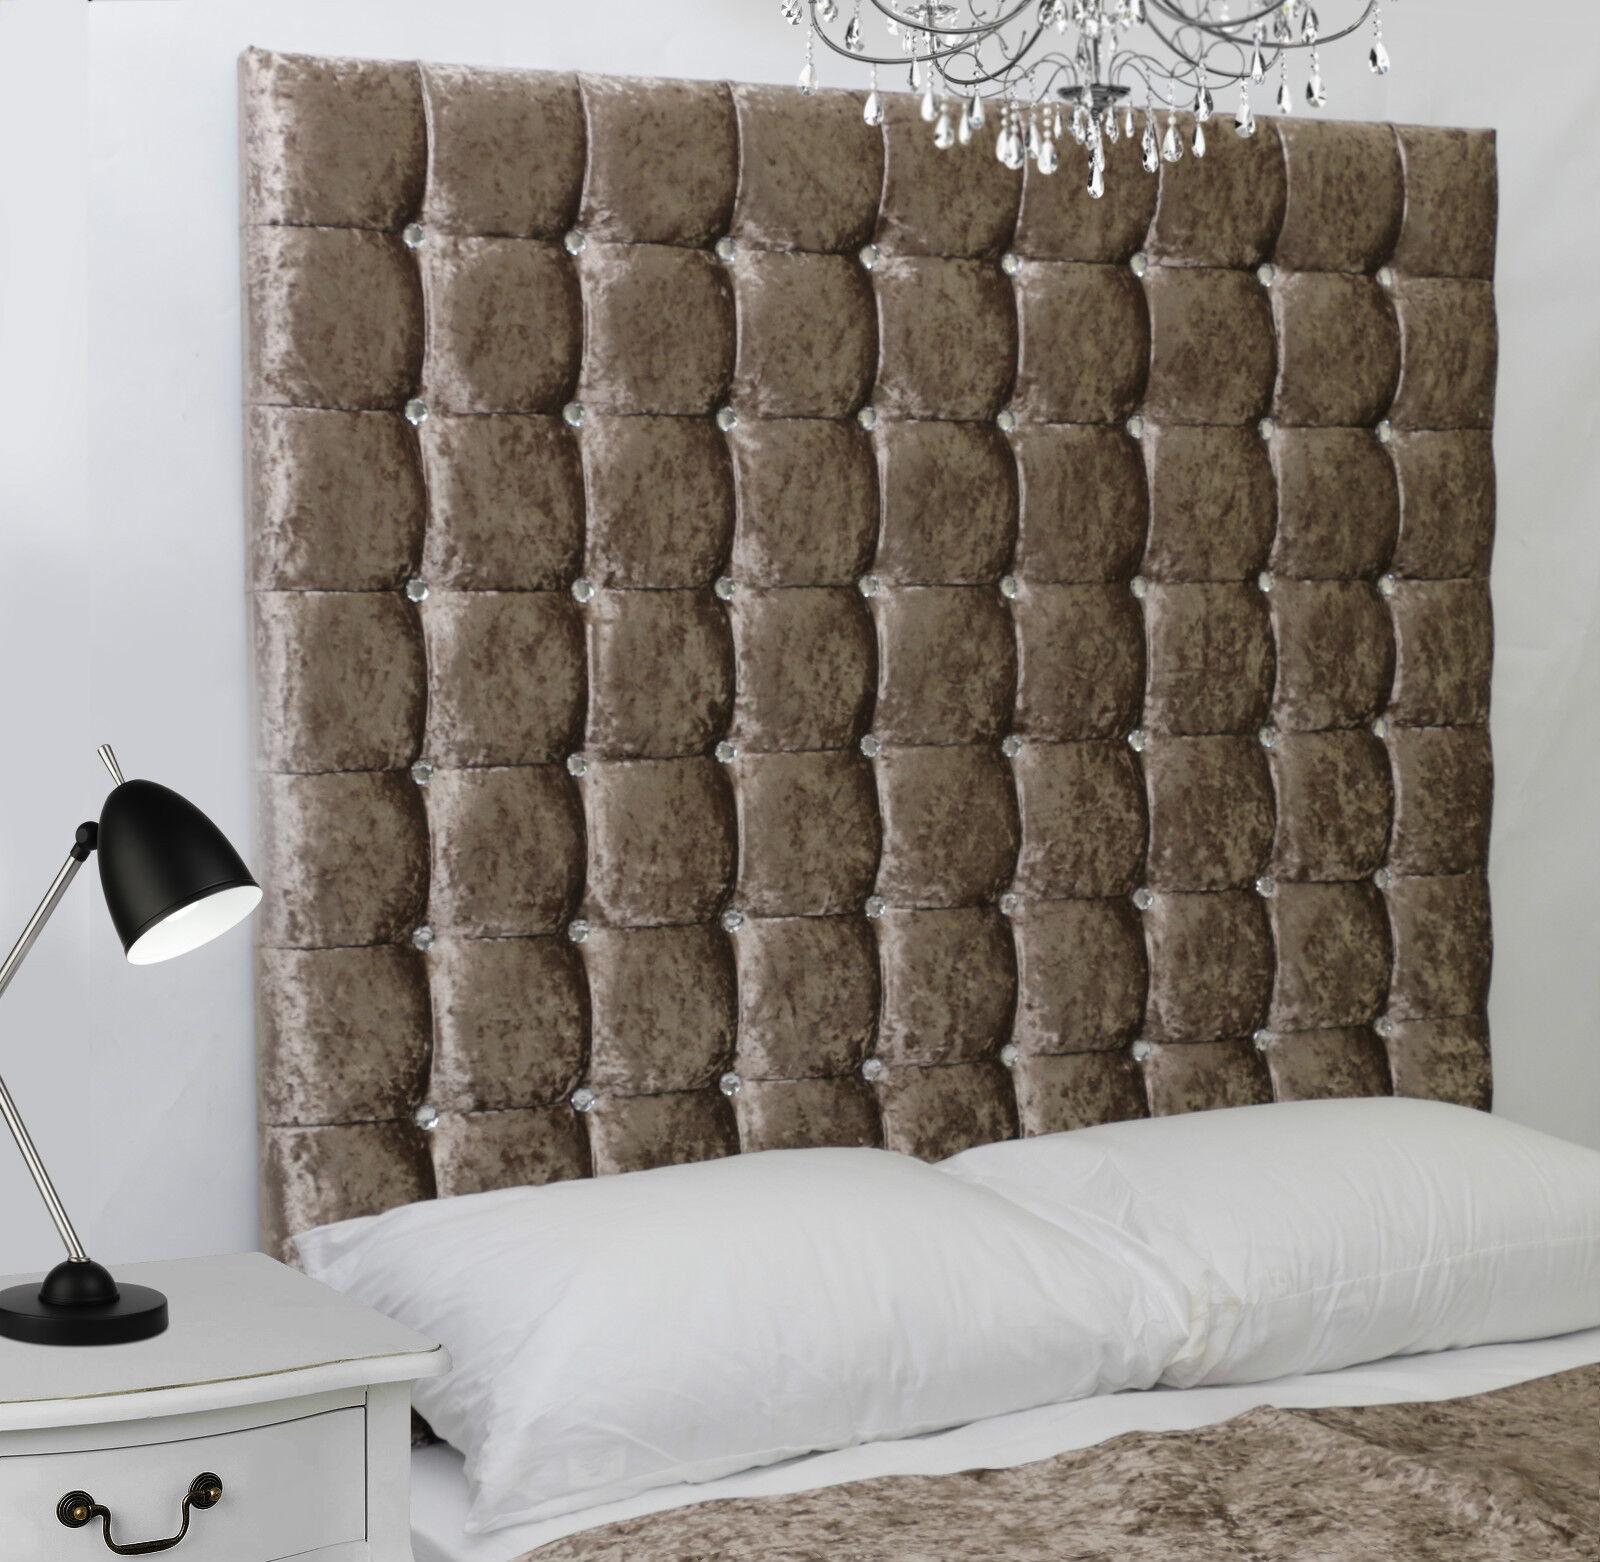 Monaco High Diamante Buttoned Bed Headboard Crush Velvet